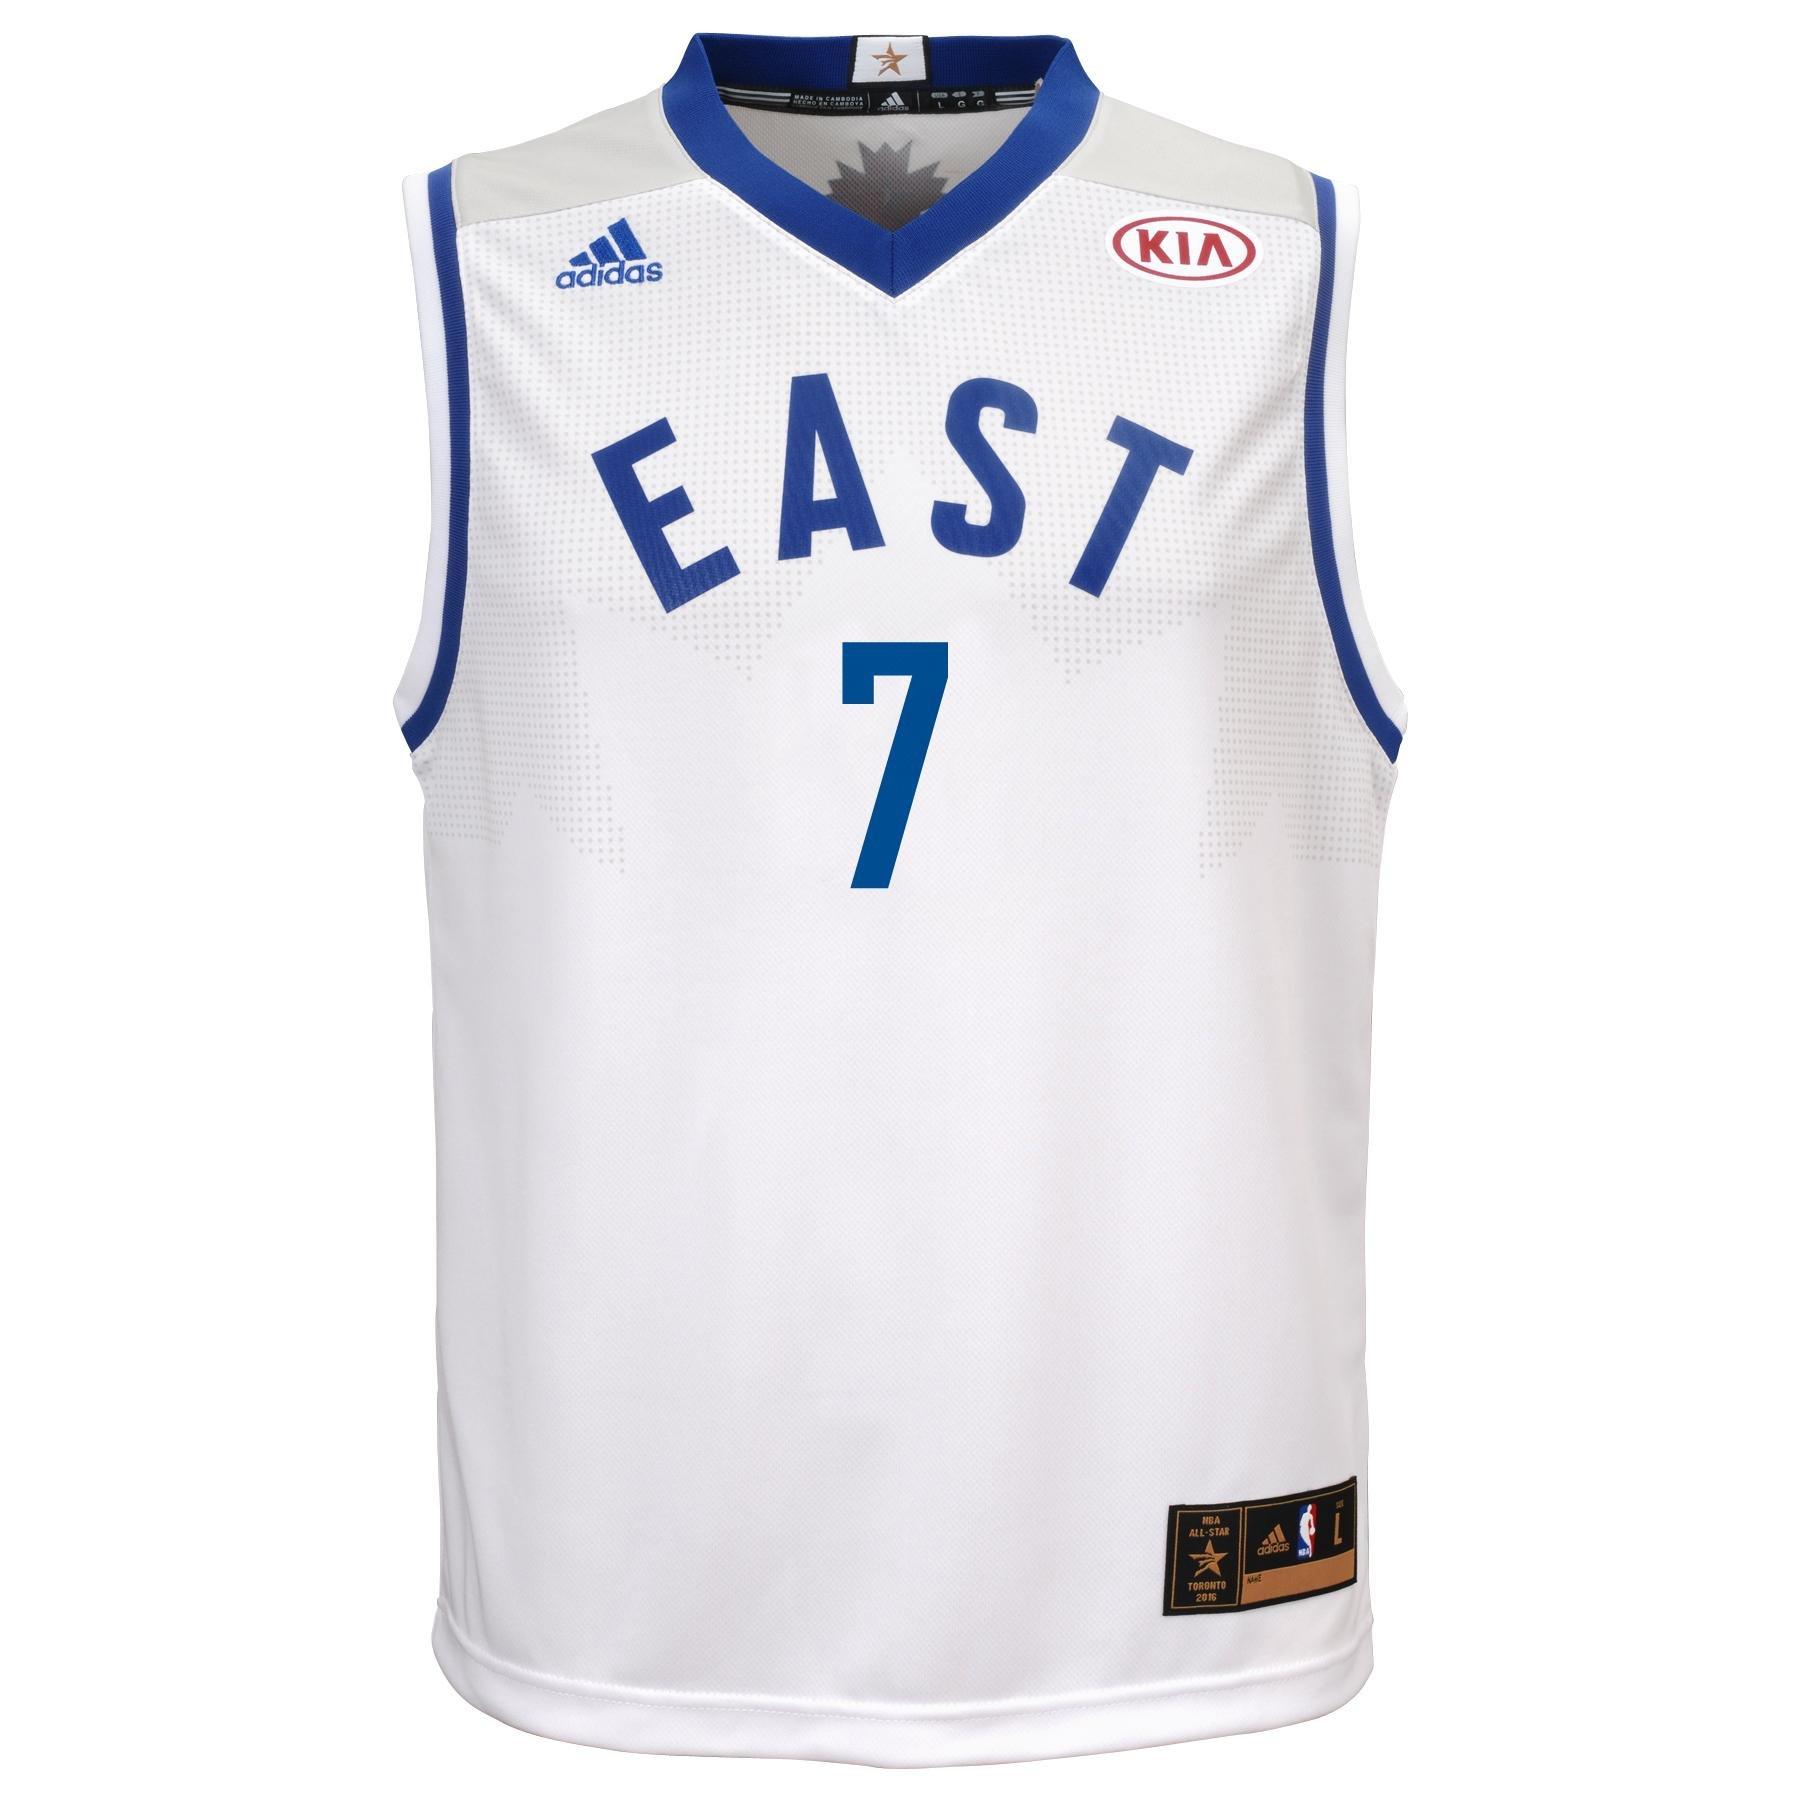 super popular 17991 1cd3a NBA All-Star East (Paul George) All-Star Replica Jersey, Youth Medium(10-12)